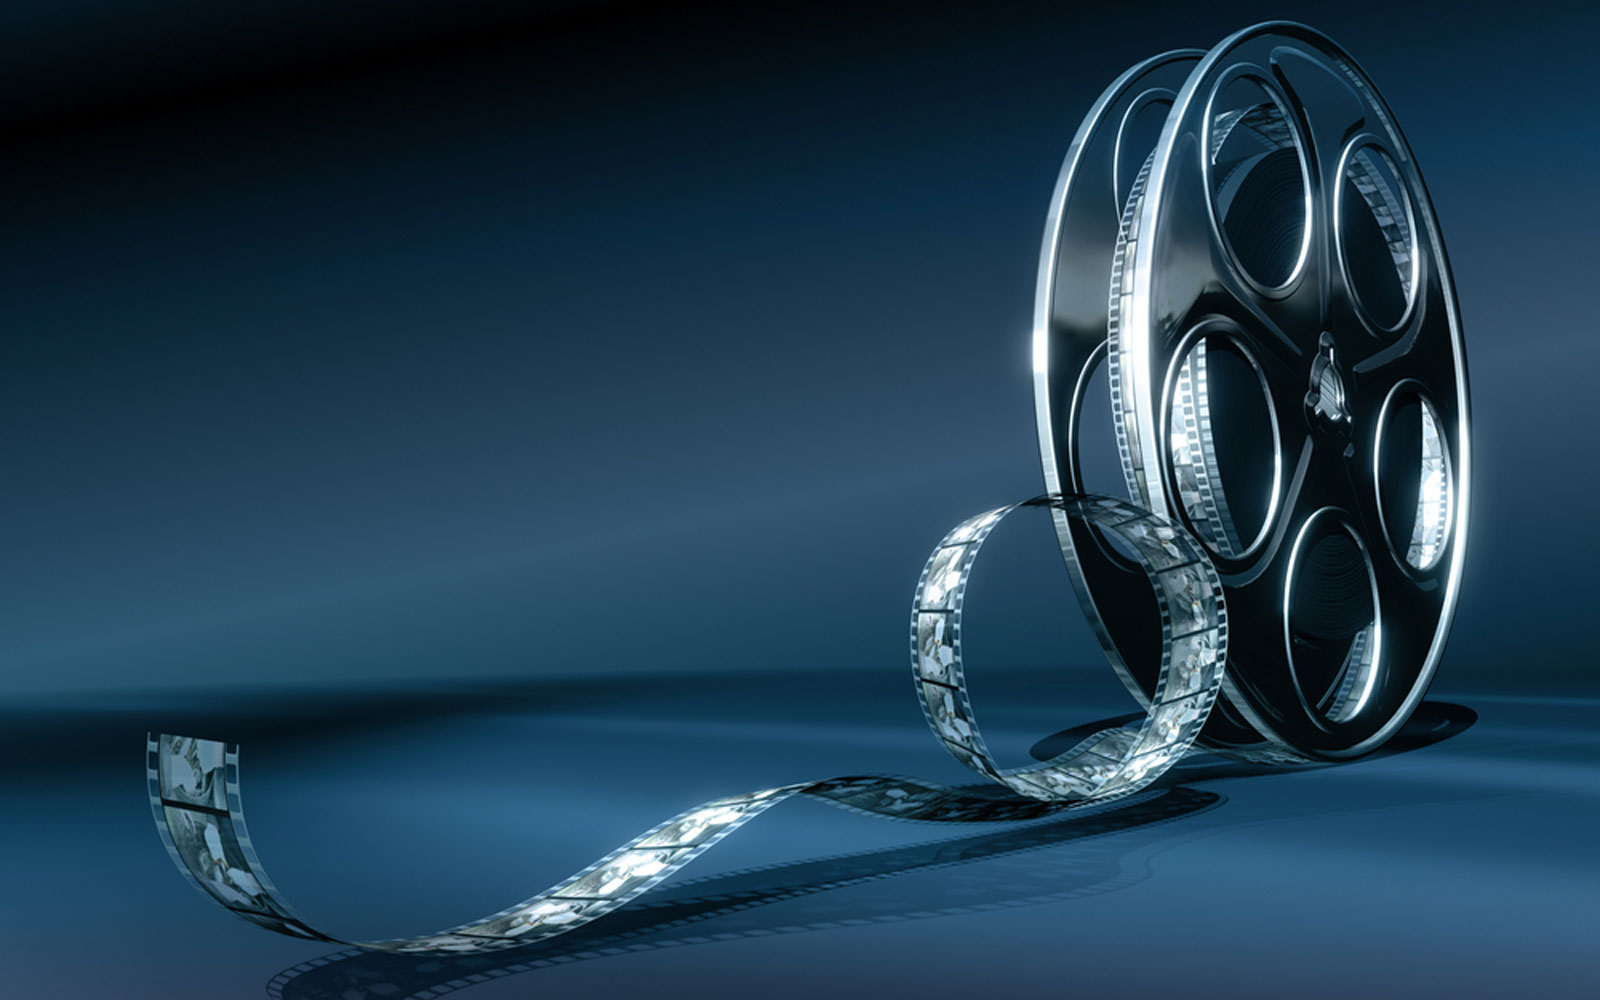 uluslararasi-izmir-kisa-film-festivali-1549